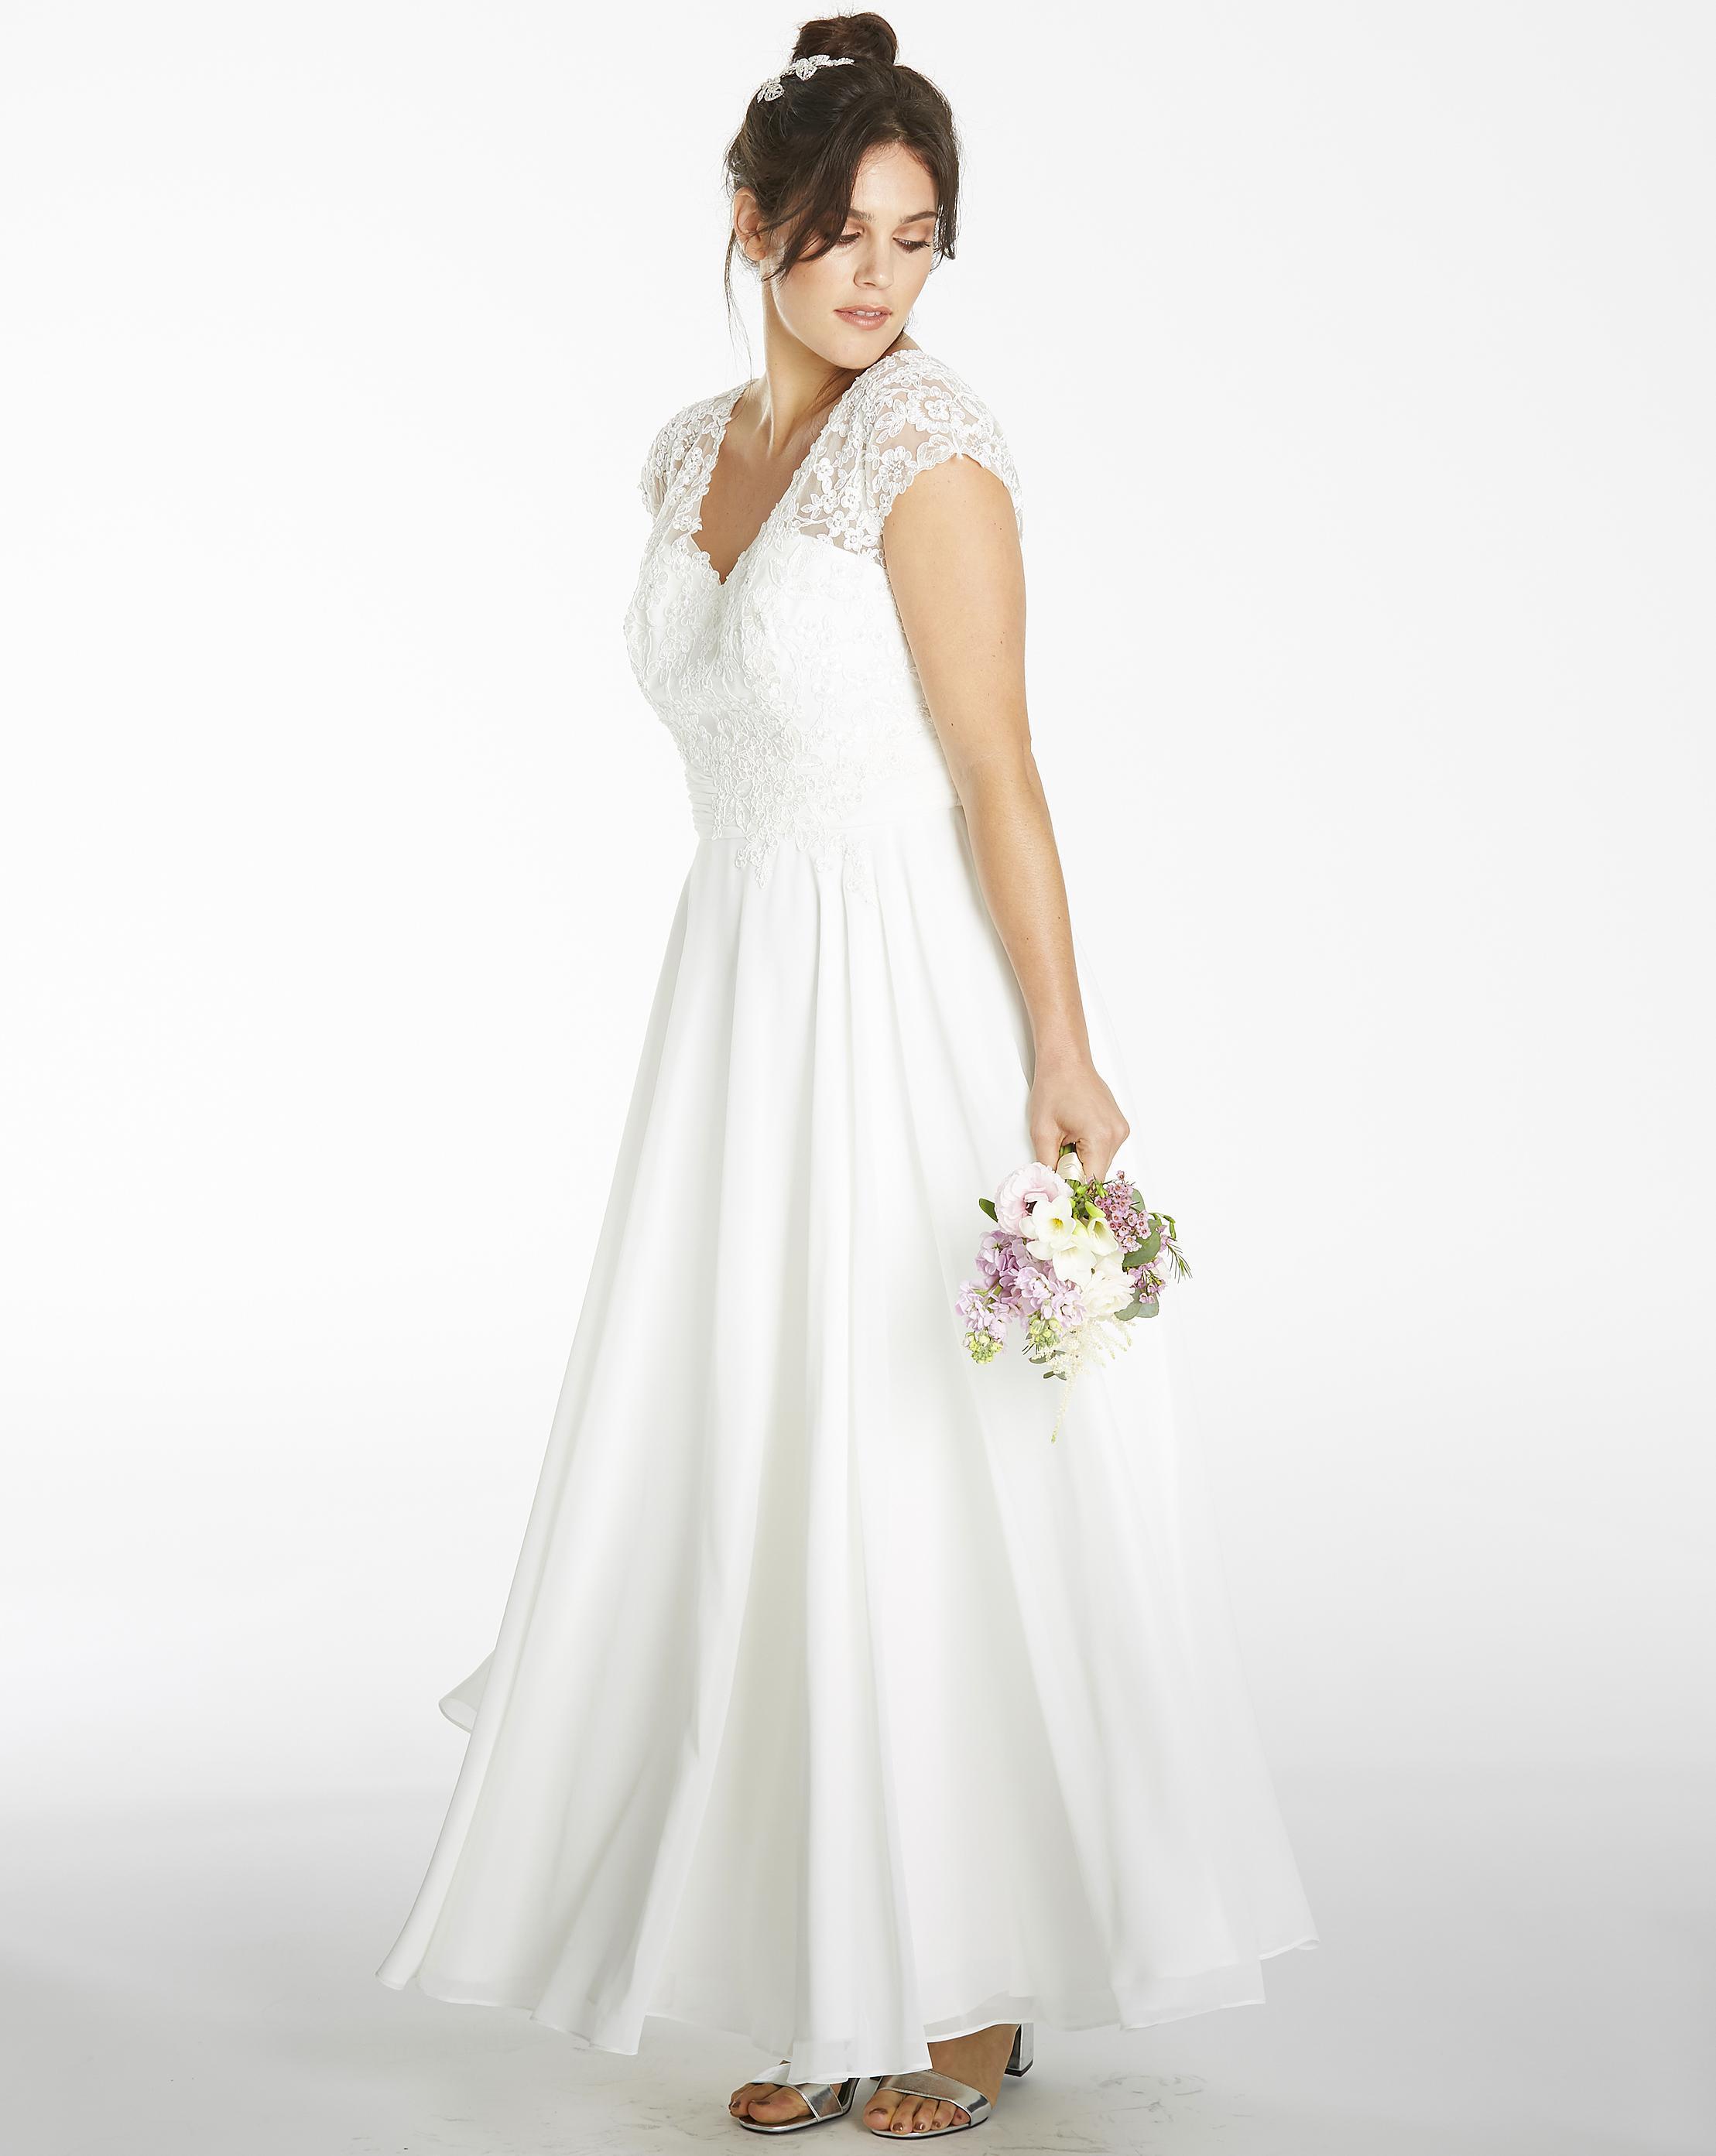 ea0e942b2f2 Simply Be Joanna Hope Lace Trim Maxi Dress in White - Lyst